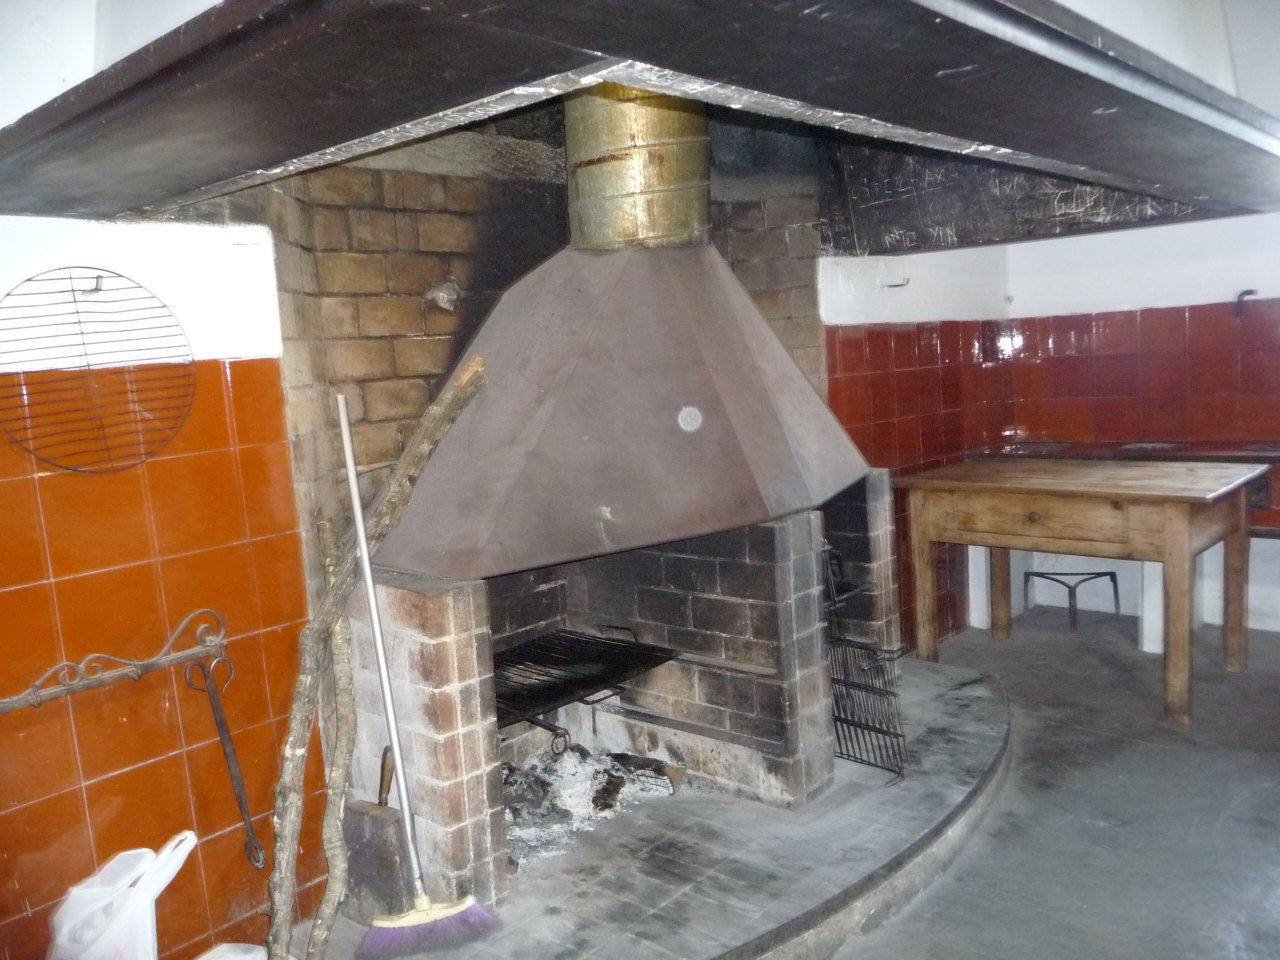 monastry puig maria kitchen fire